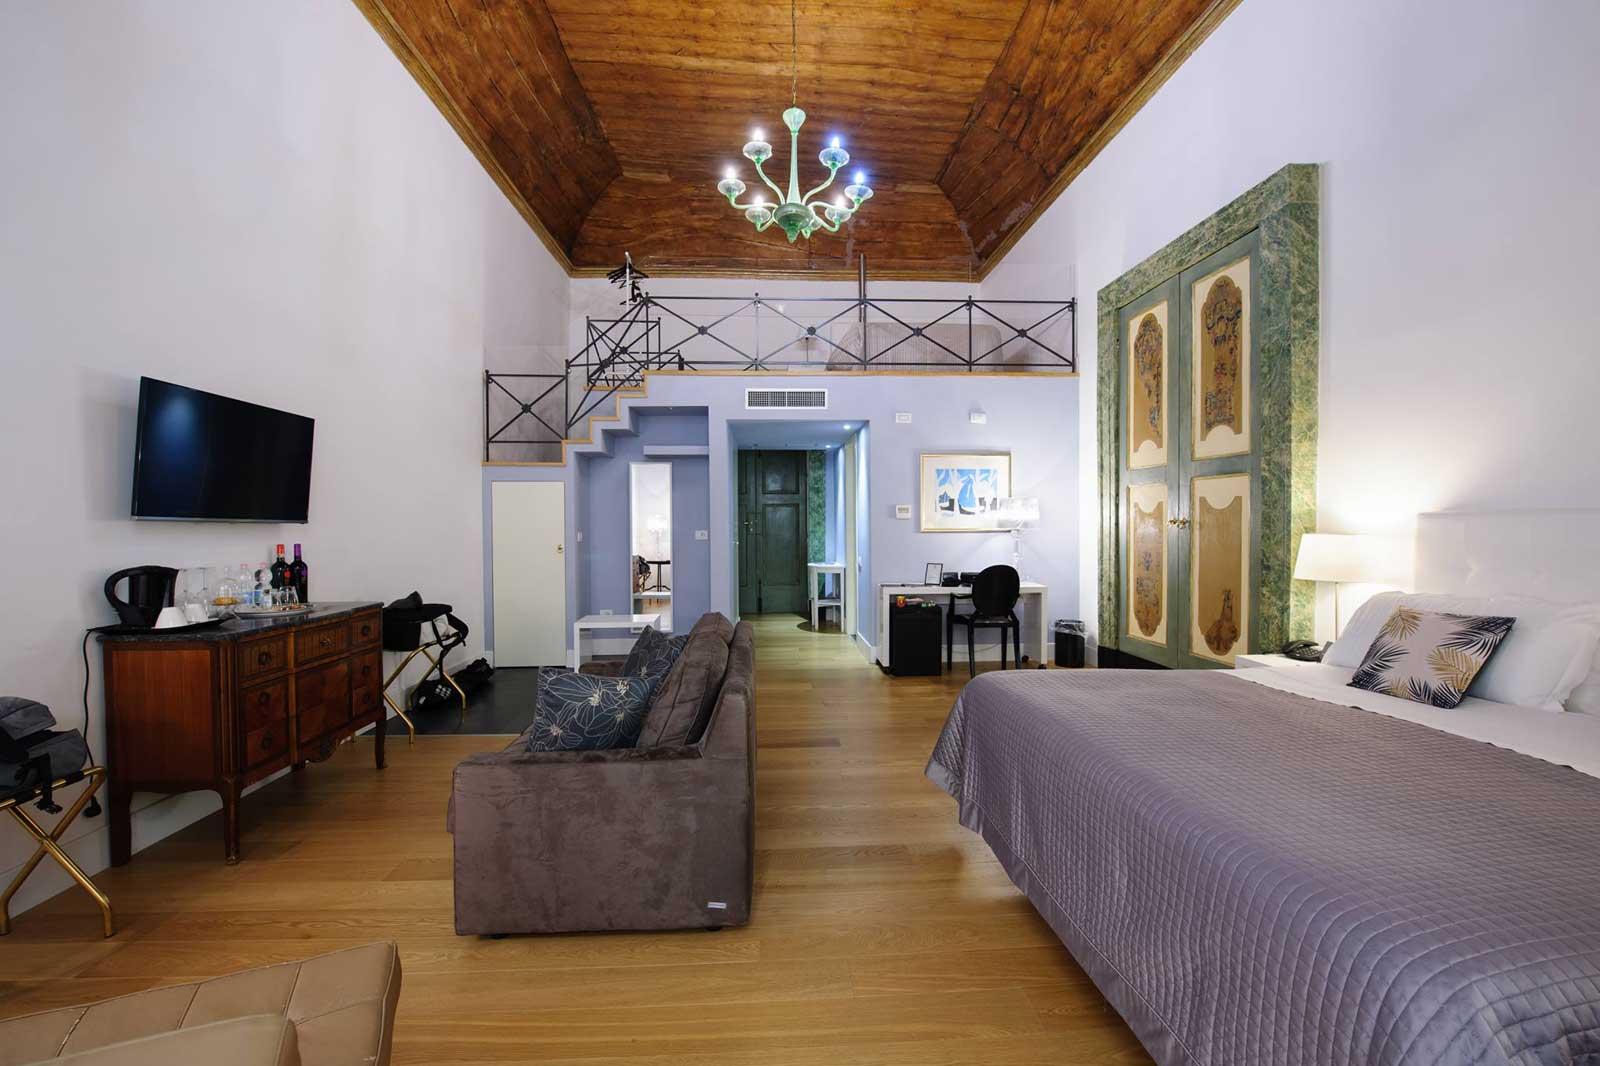 Santa Chiara Boutique Hotel 4 stelle Napoli centro storico - Executive Suite